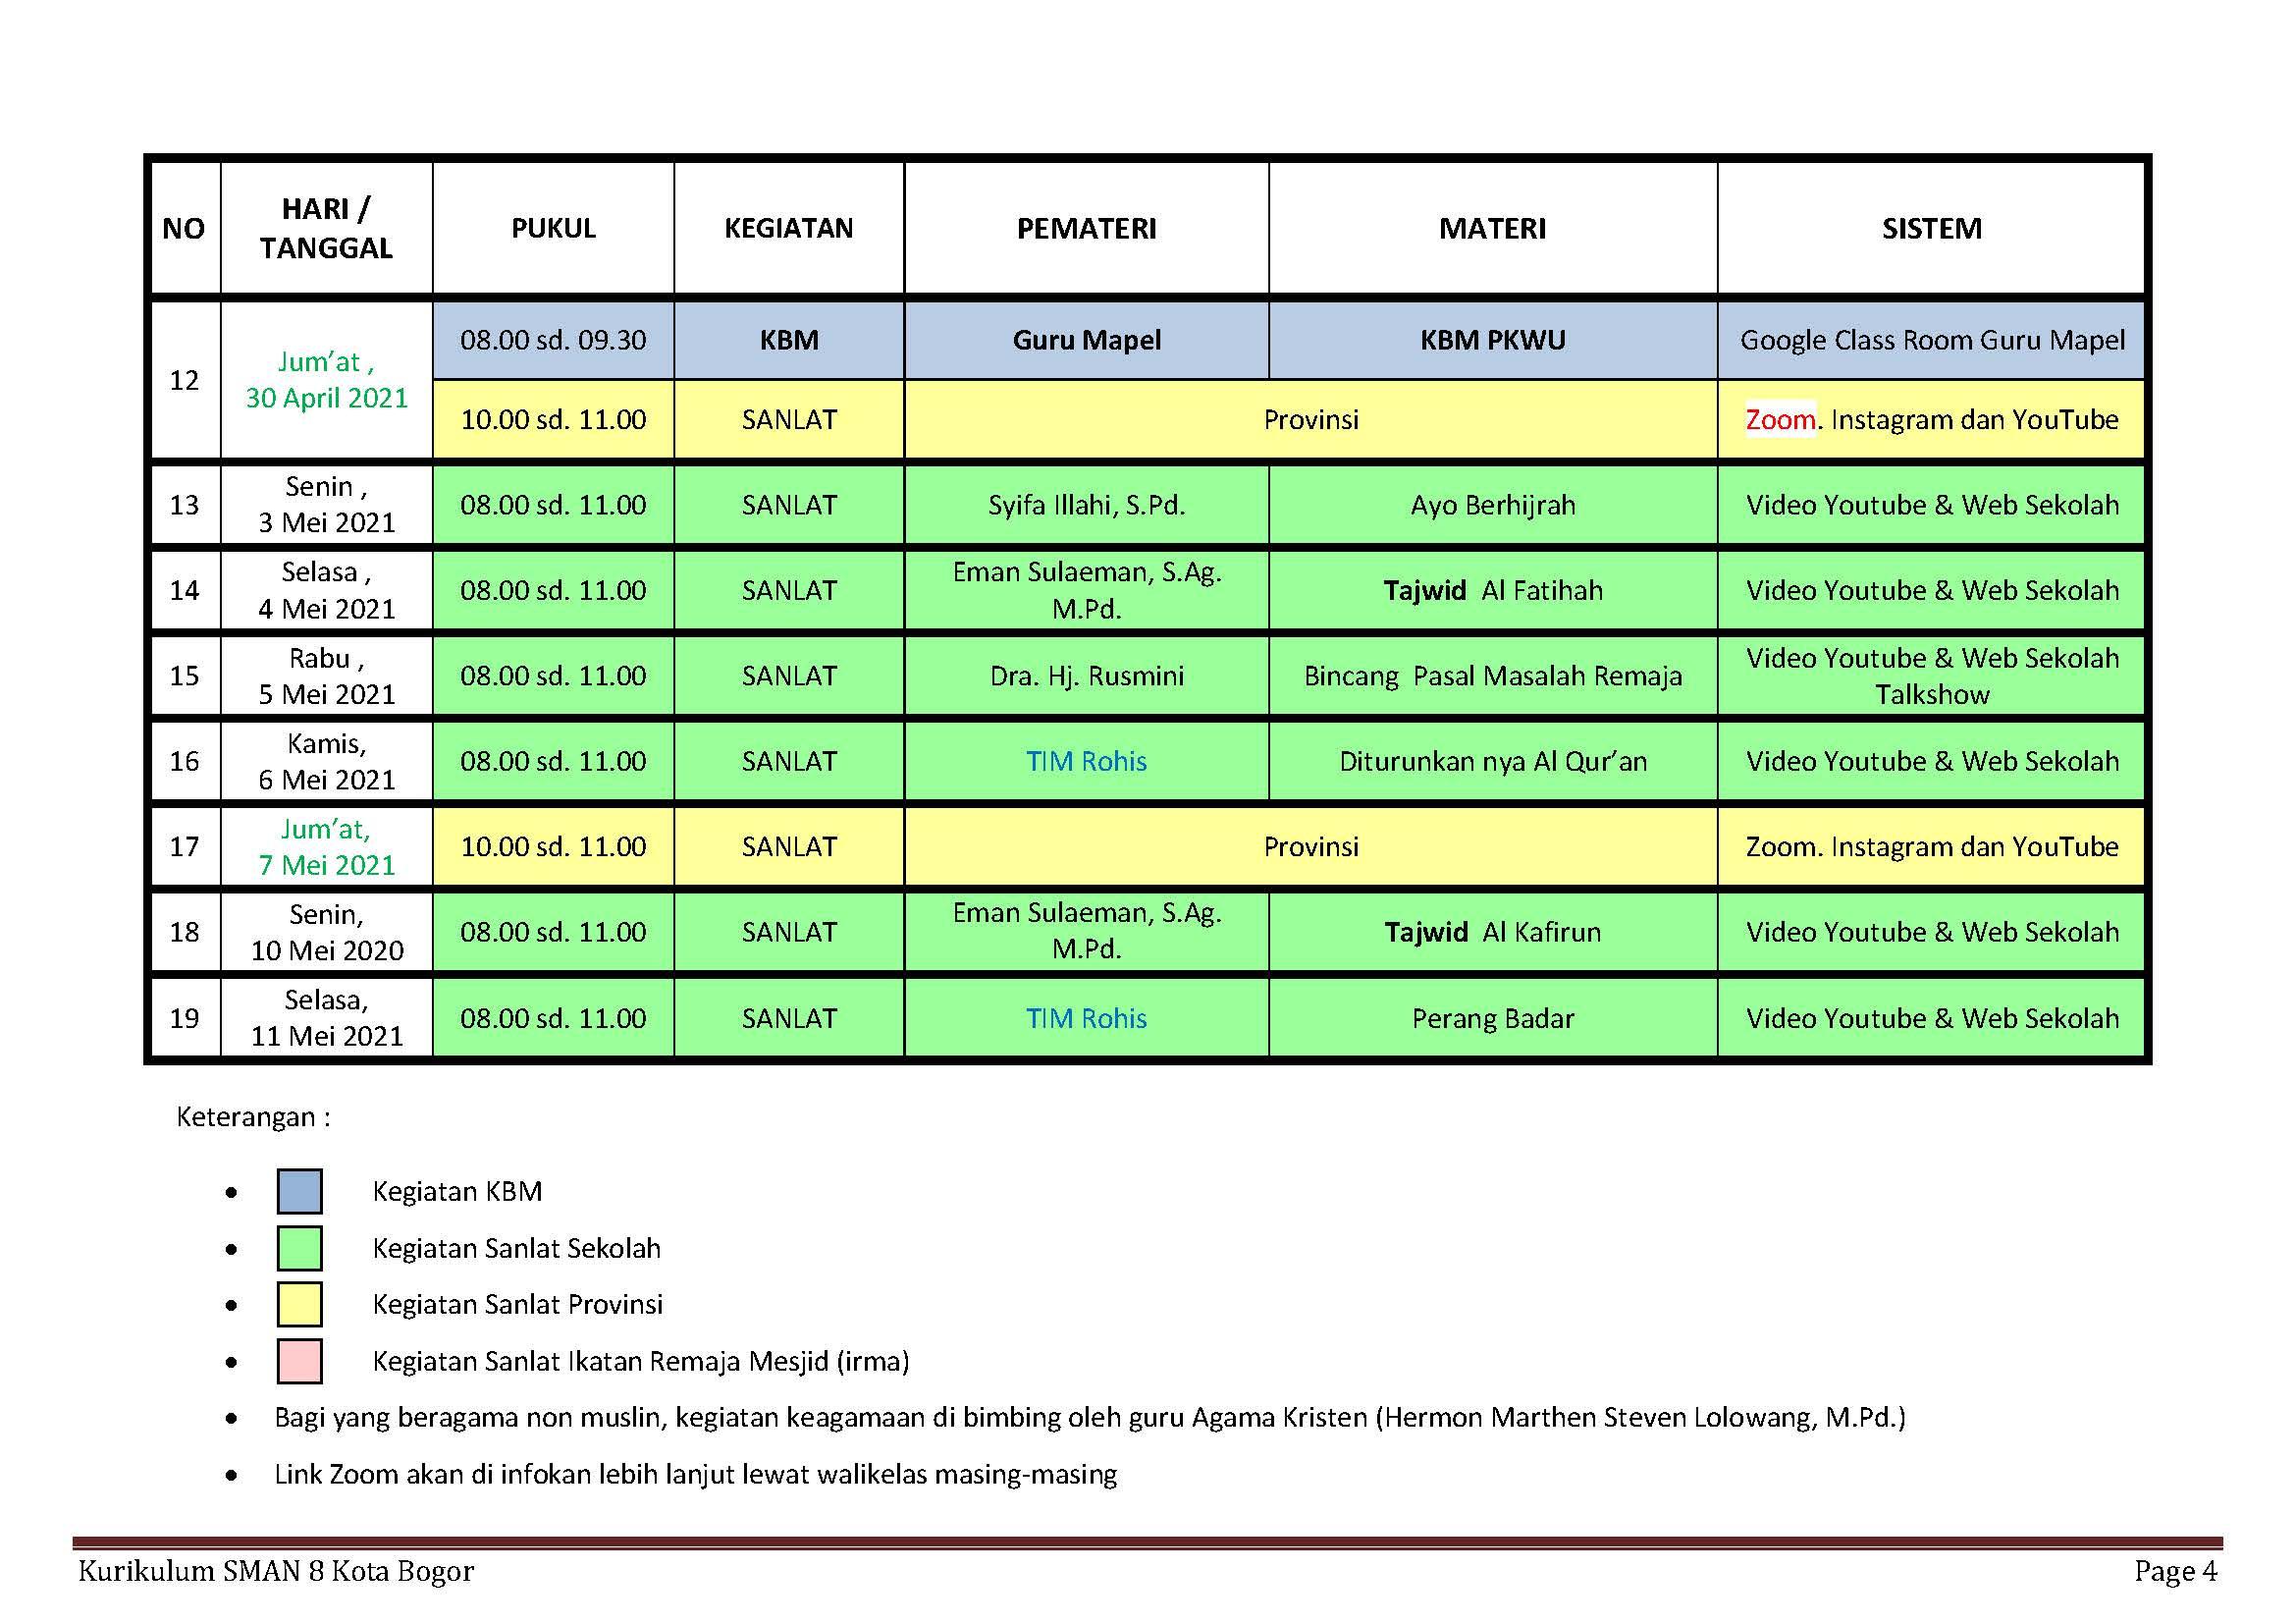 Jadwal KBM dan Sanlat 2021_Page_4